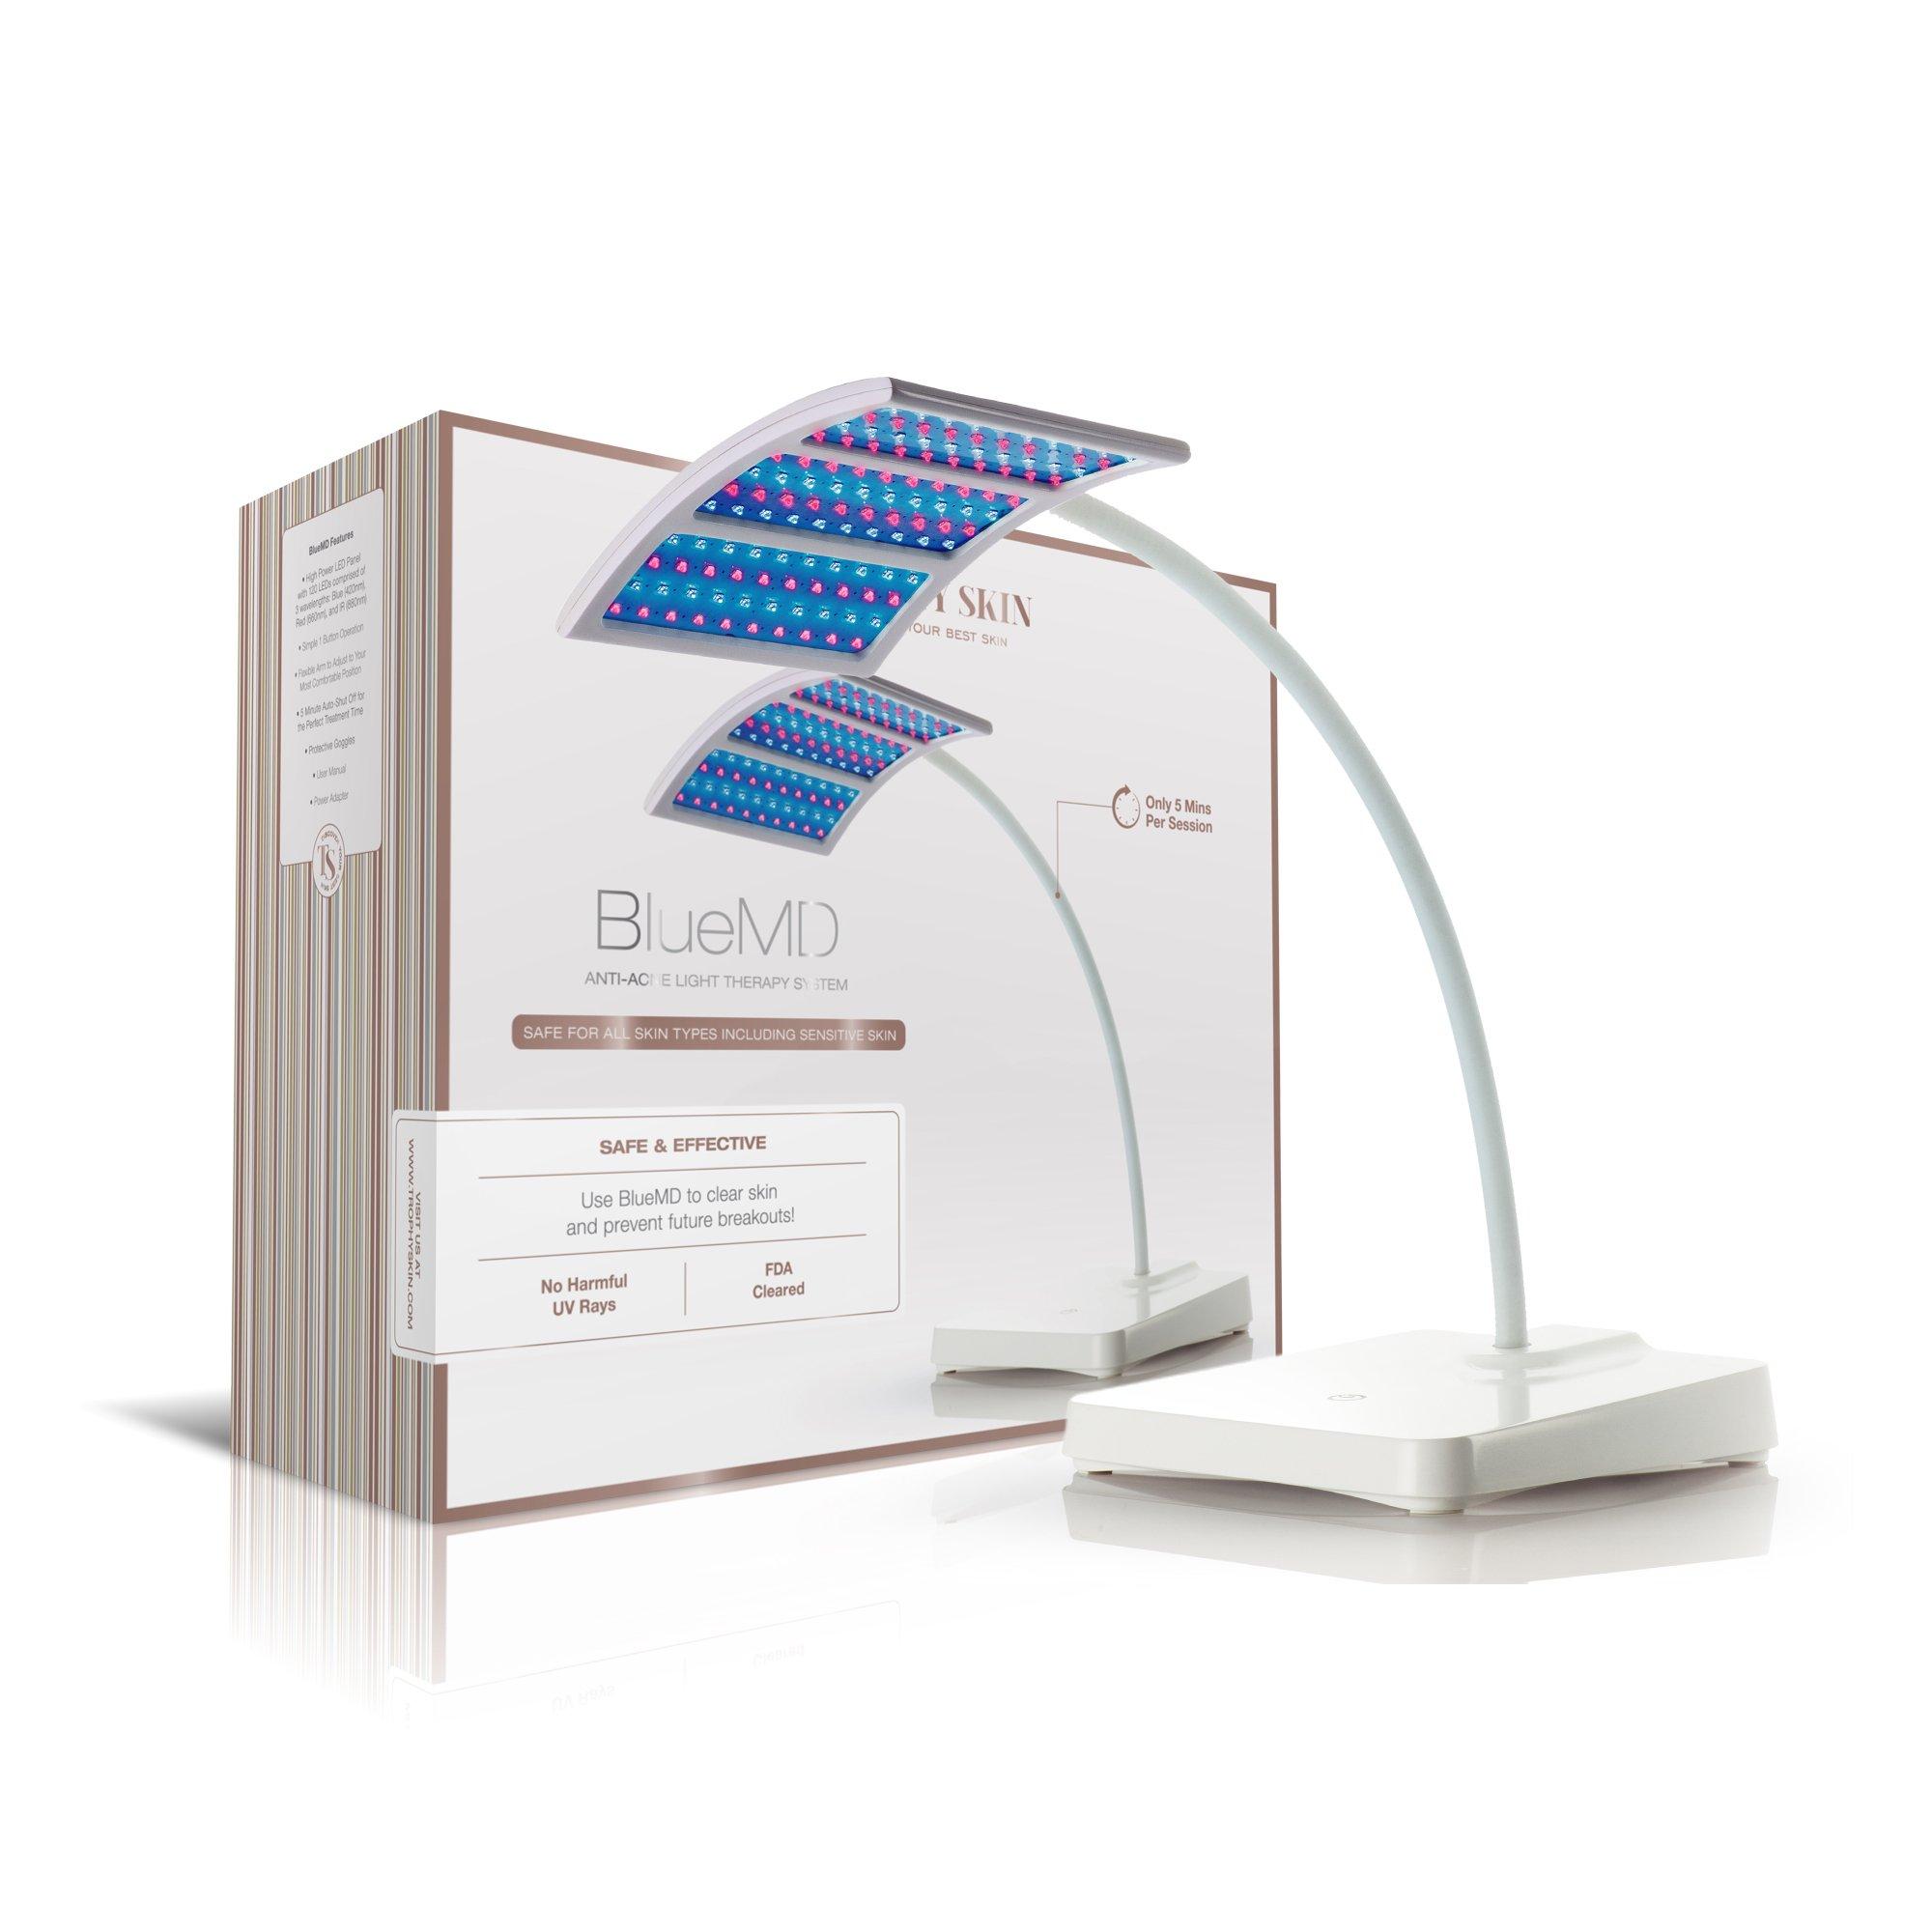 Trophy Skin BlueMD Blue LED Acne Light Therapy Beauty Device